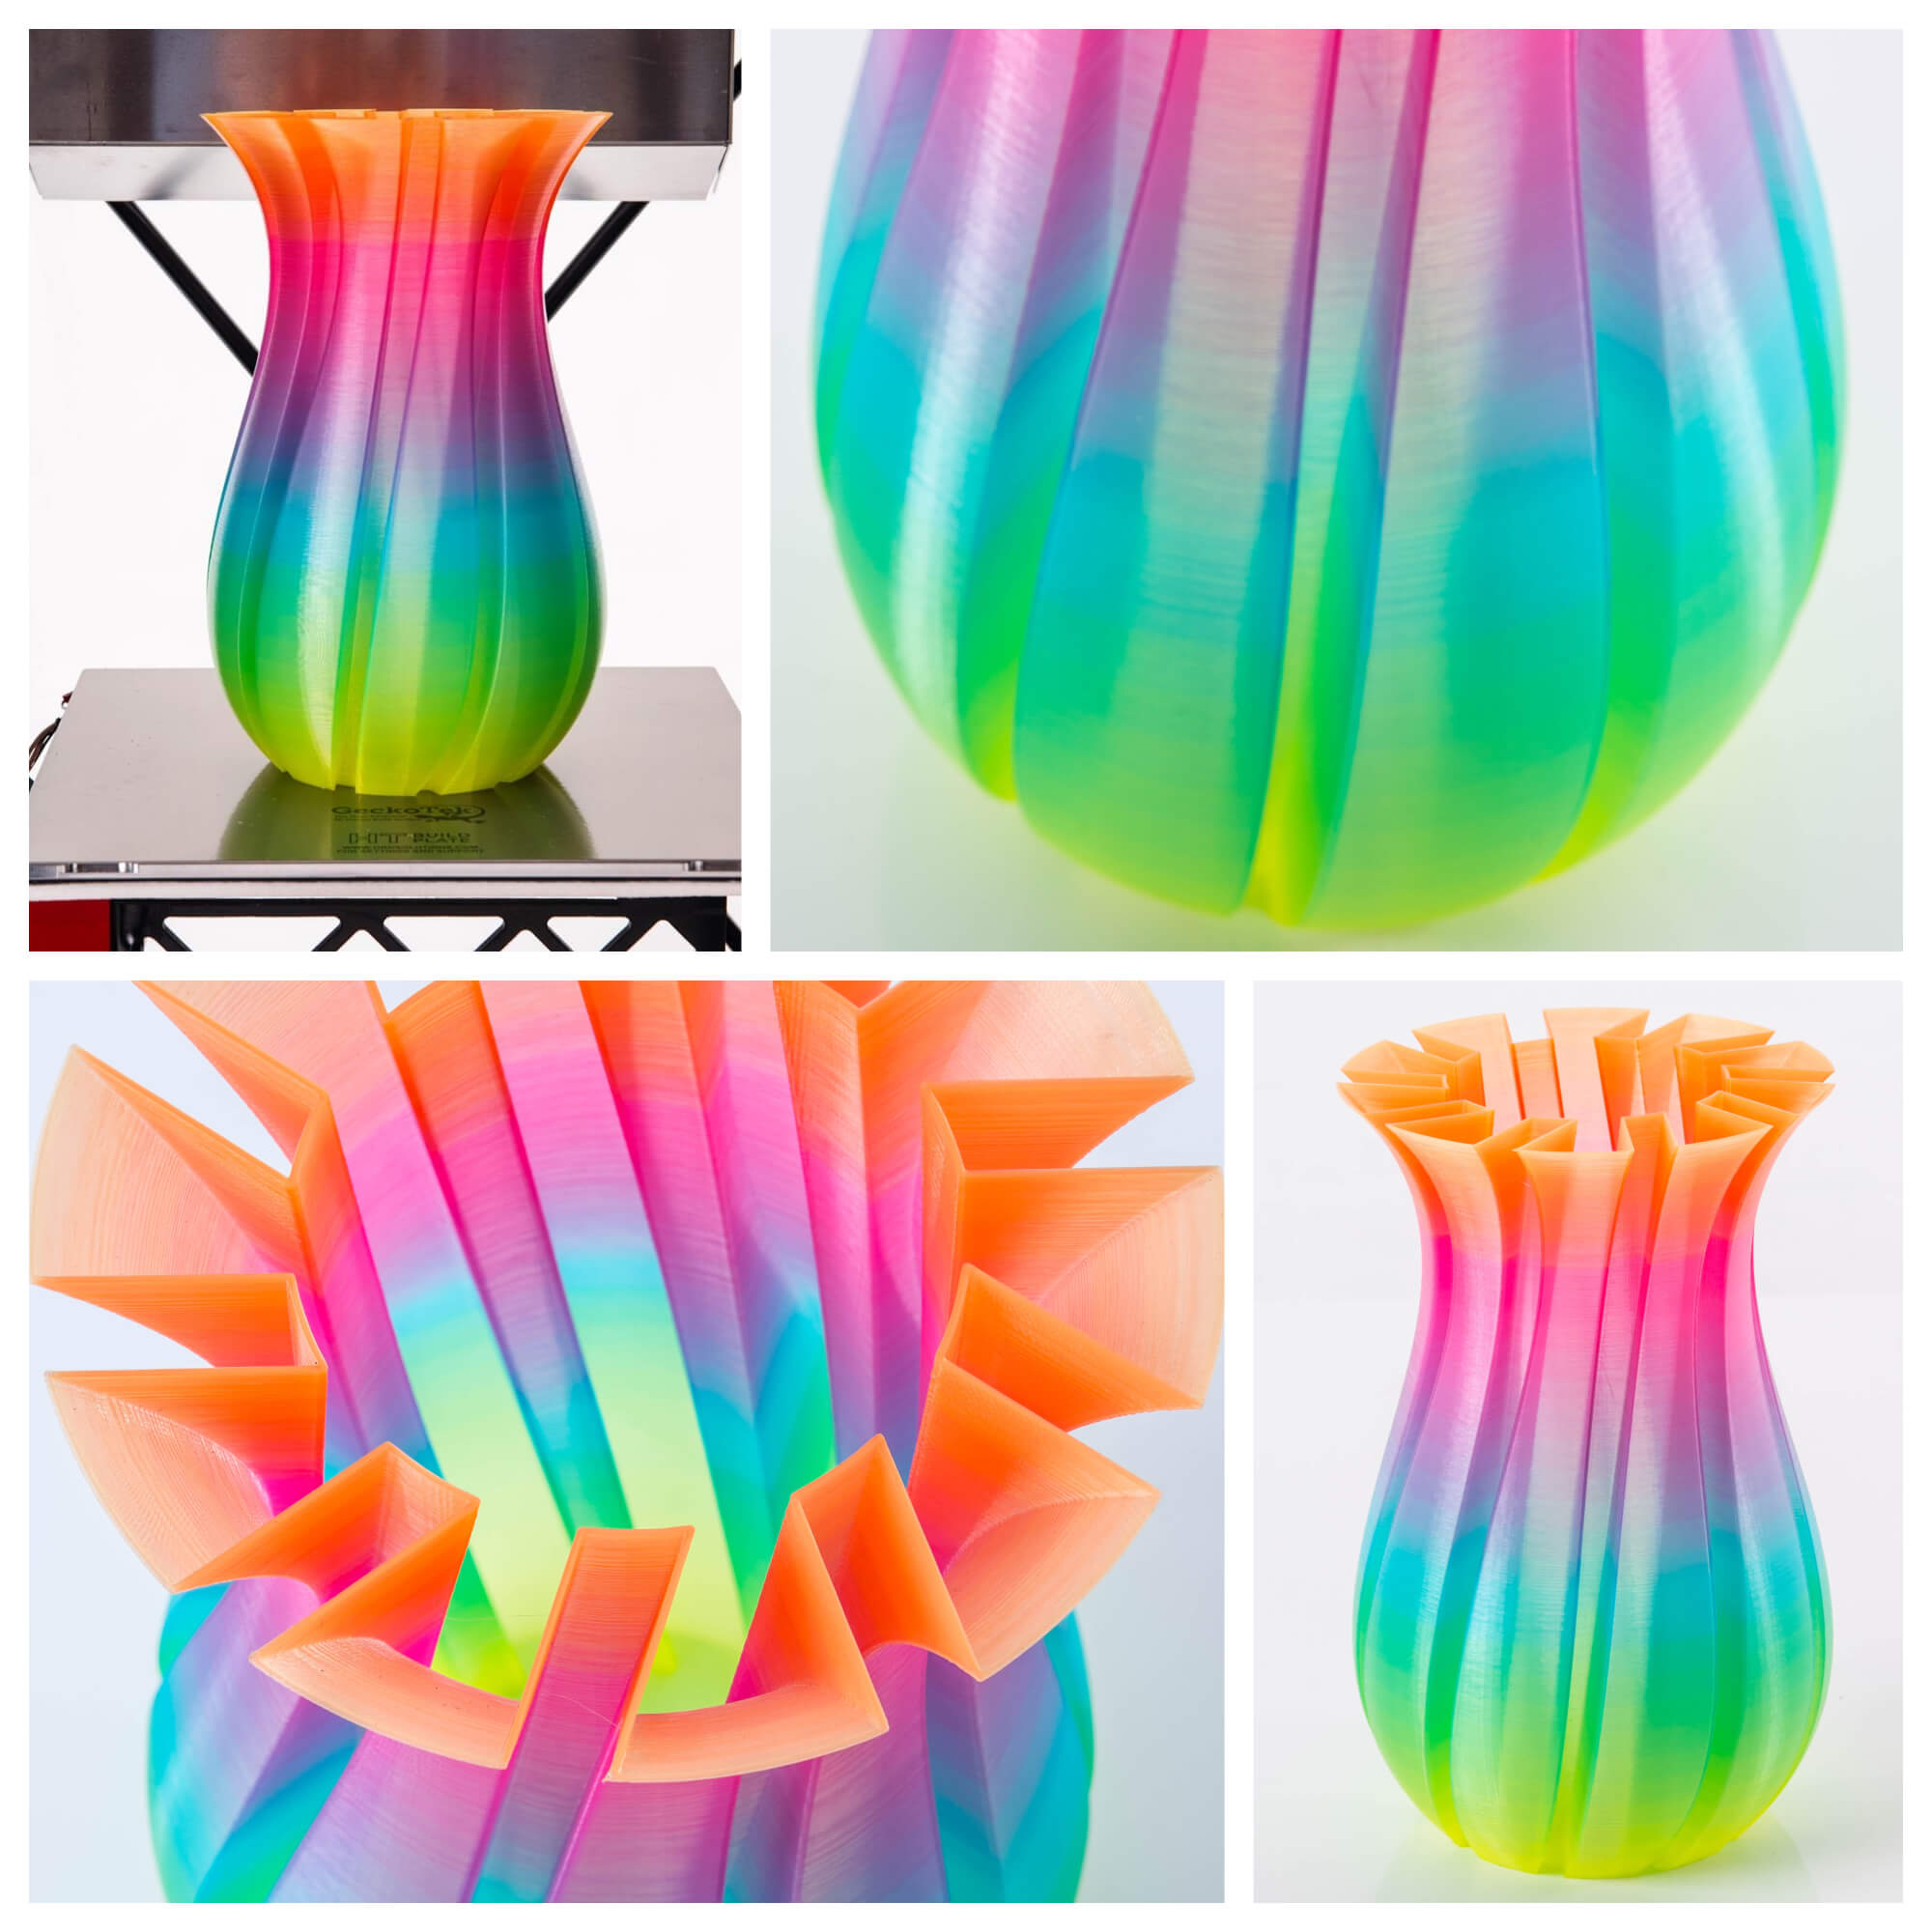 3d printed colorful vase